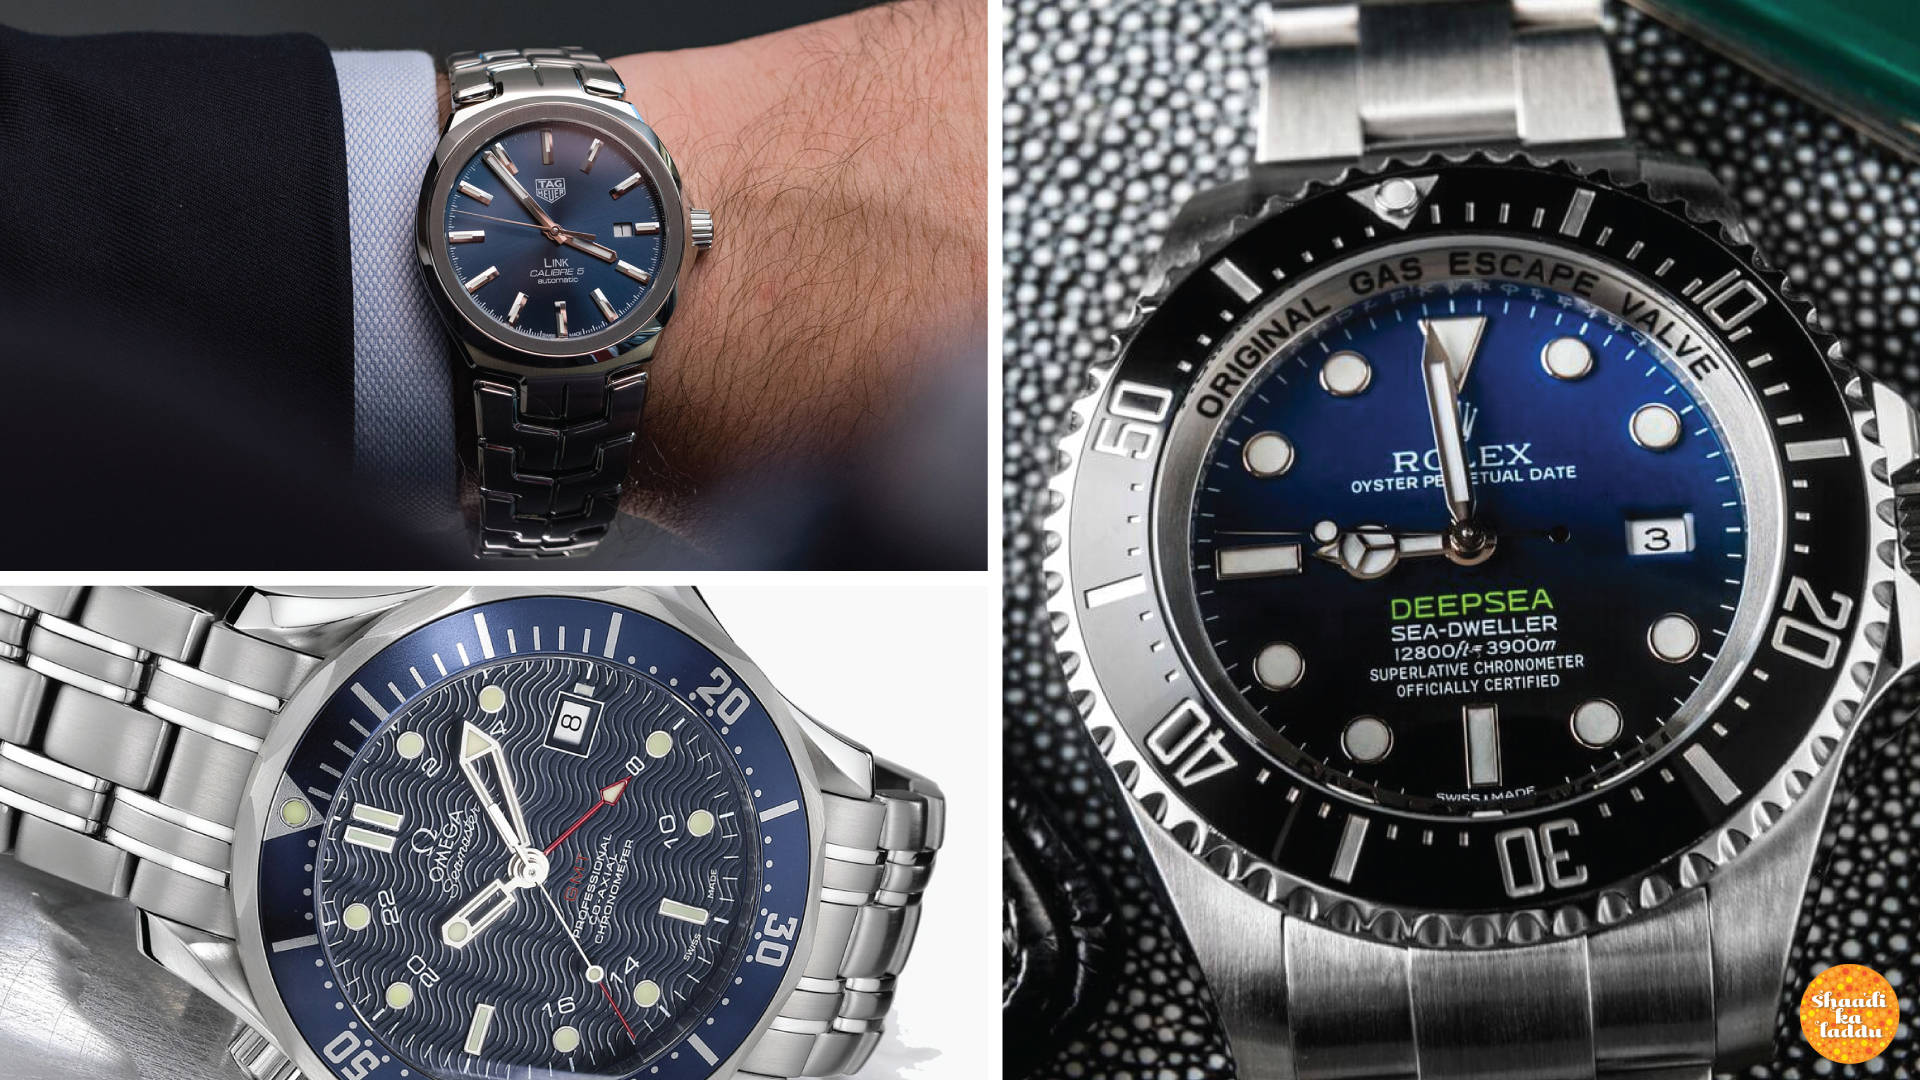 High end men's wrist watches